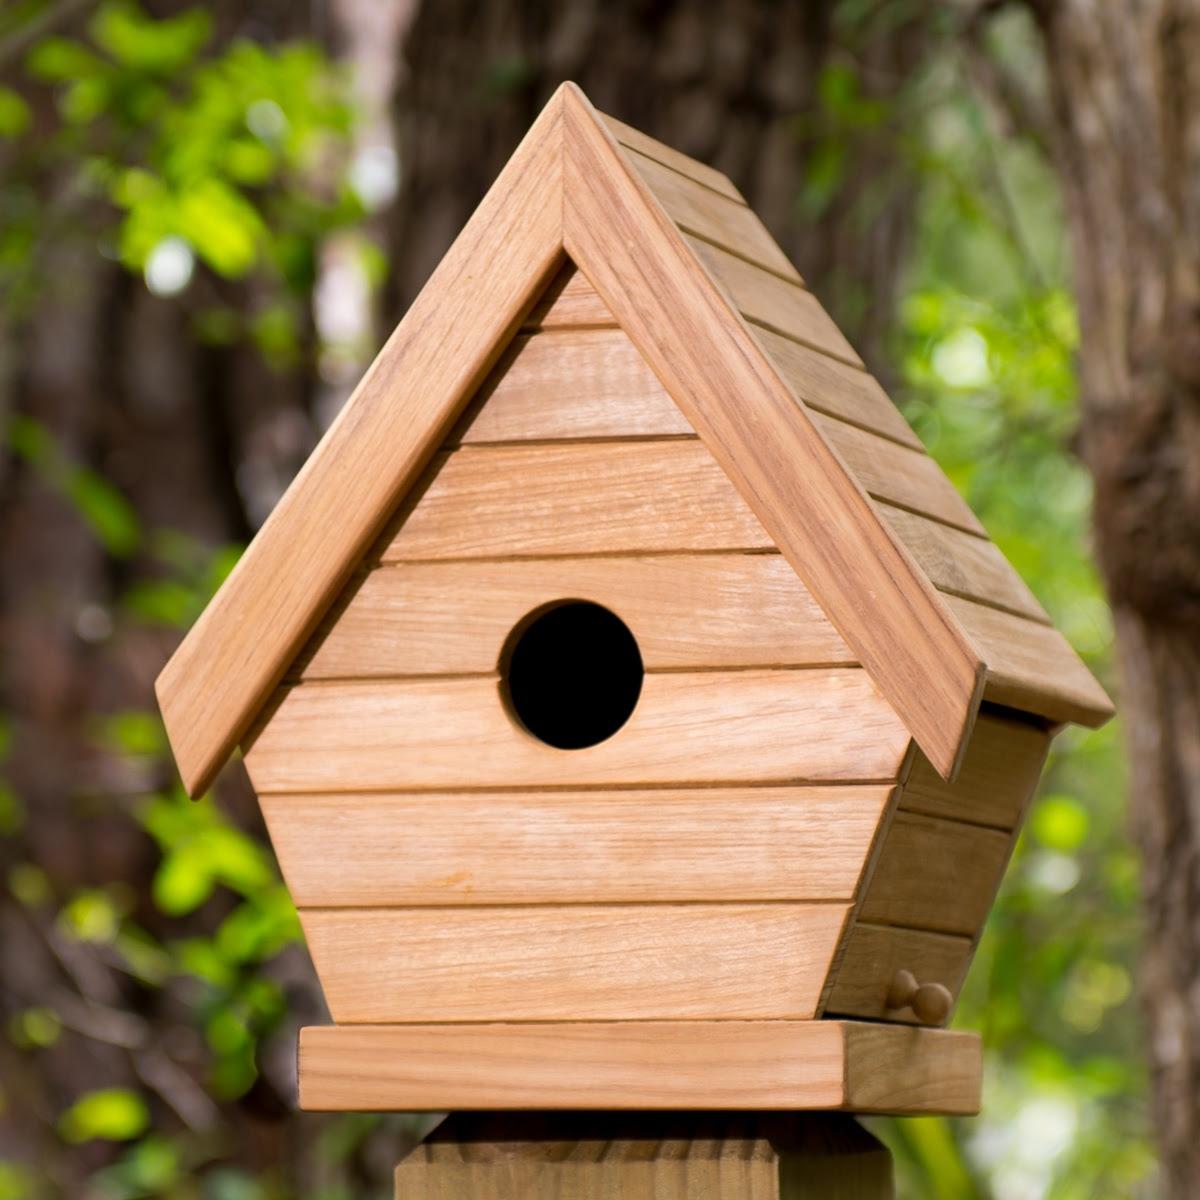 teak bird house Westminster Teak Outdoor Furniture